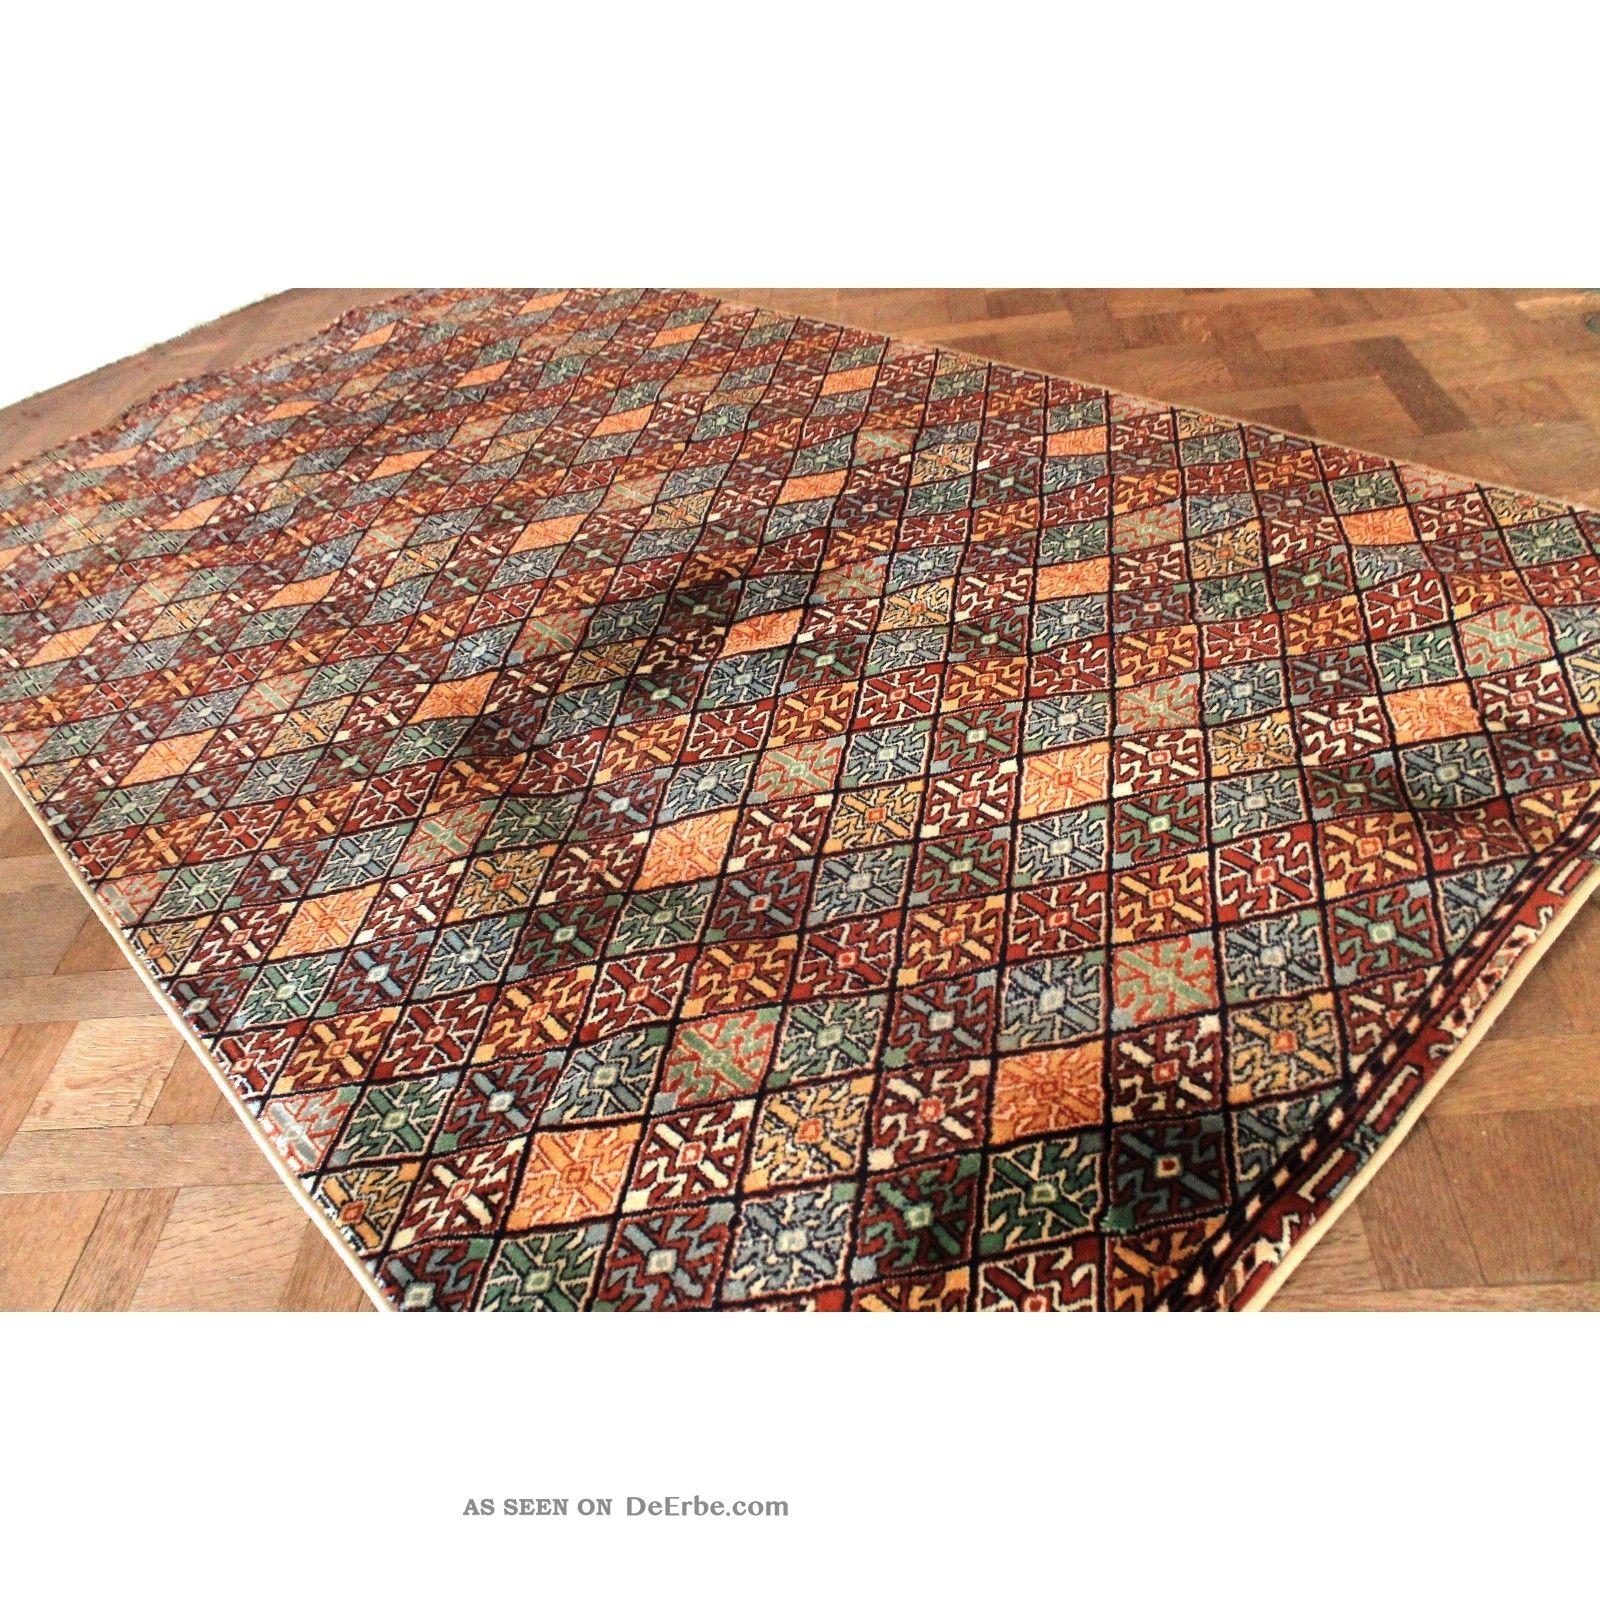 gewebter orient teppich kum felder nain design tappeto. Black Bedroom Furniture Sets. Home Design Ideas